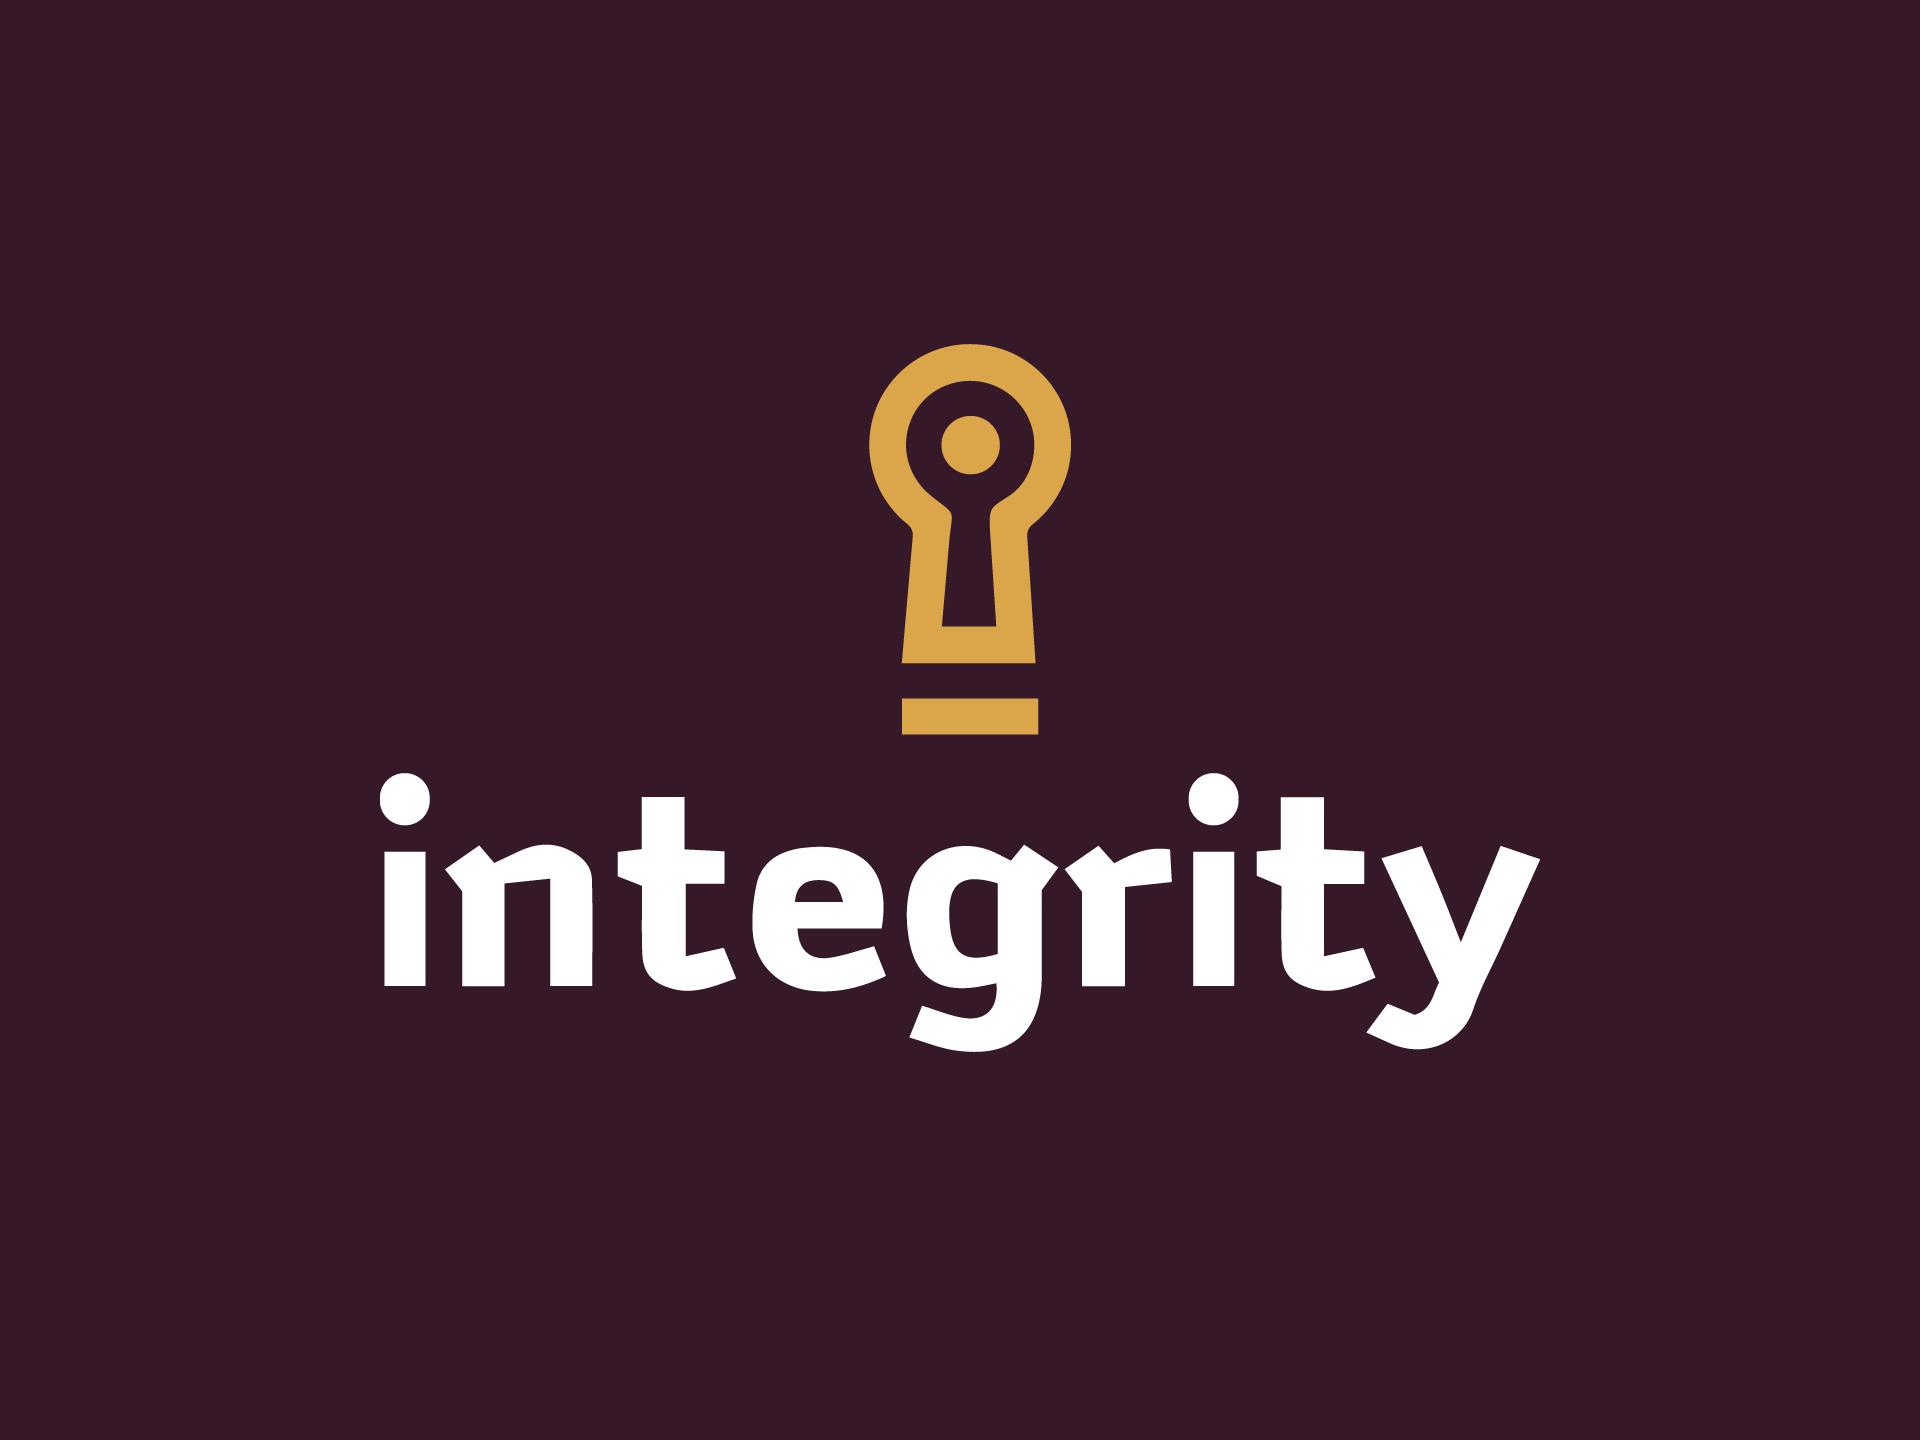 Integrity concept design